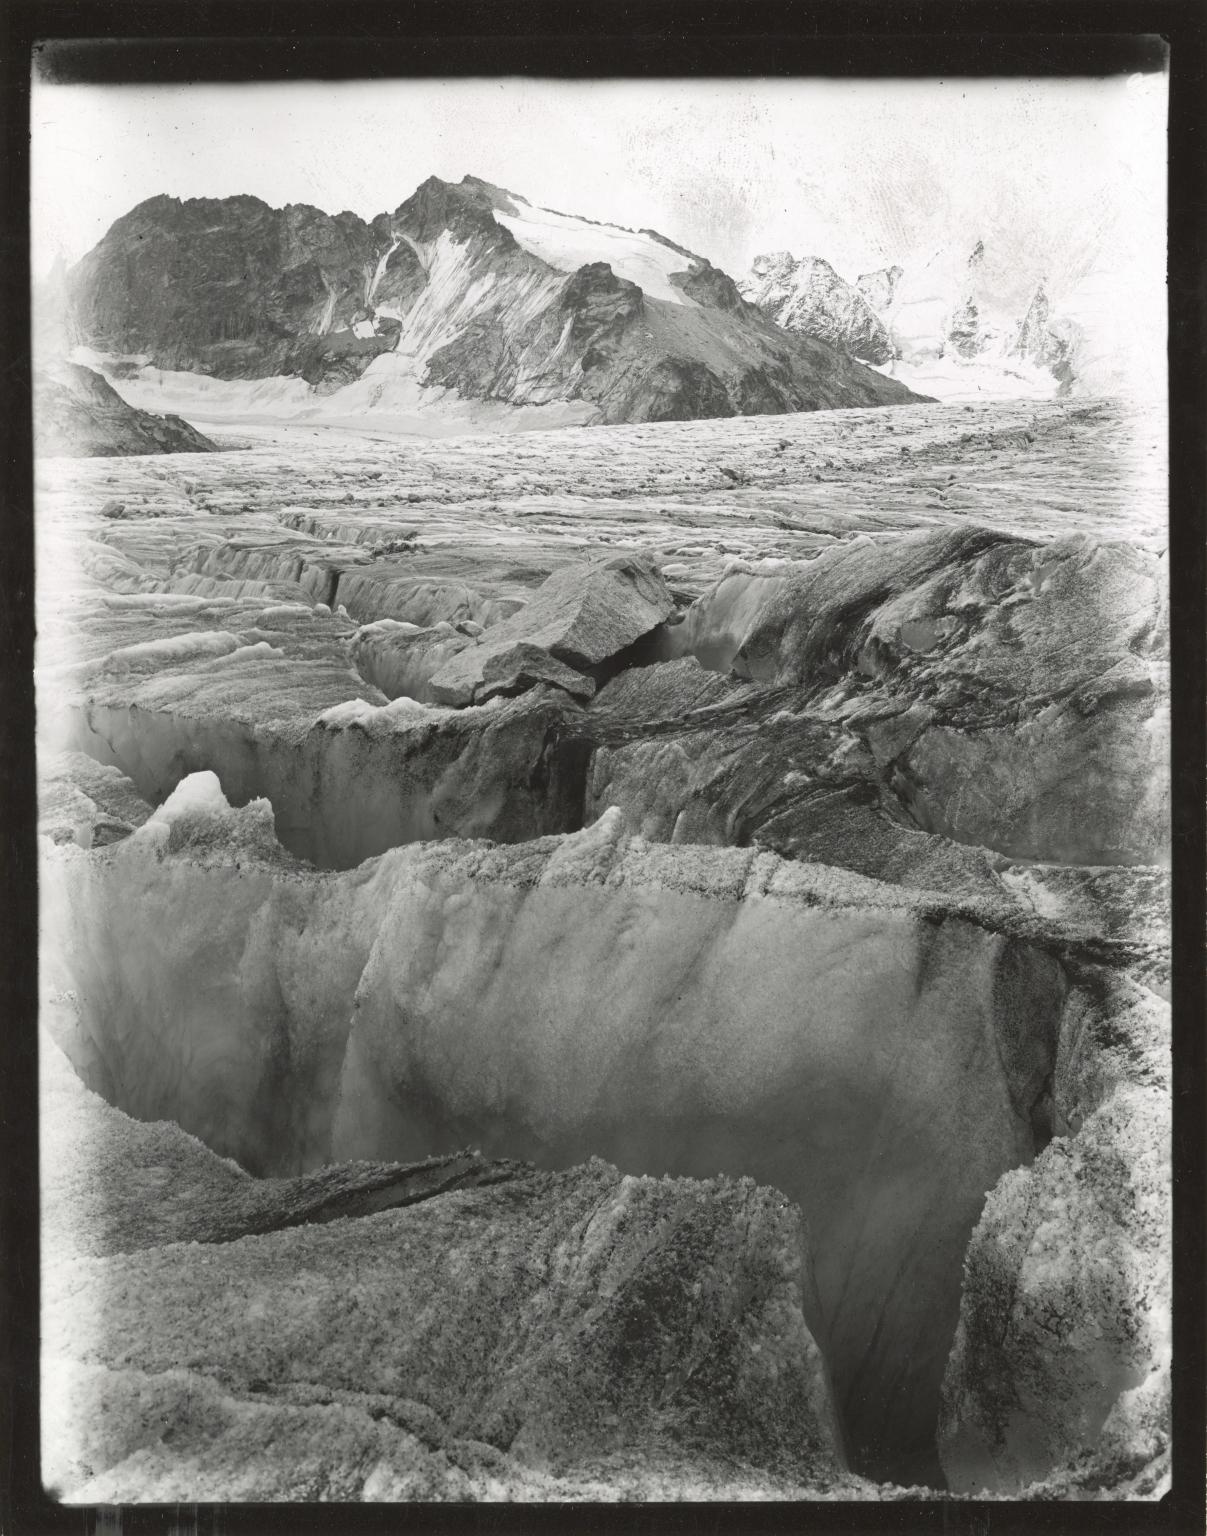 Forno Glacier, Switzerland